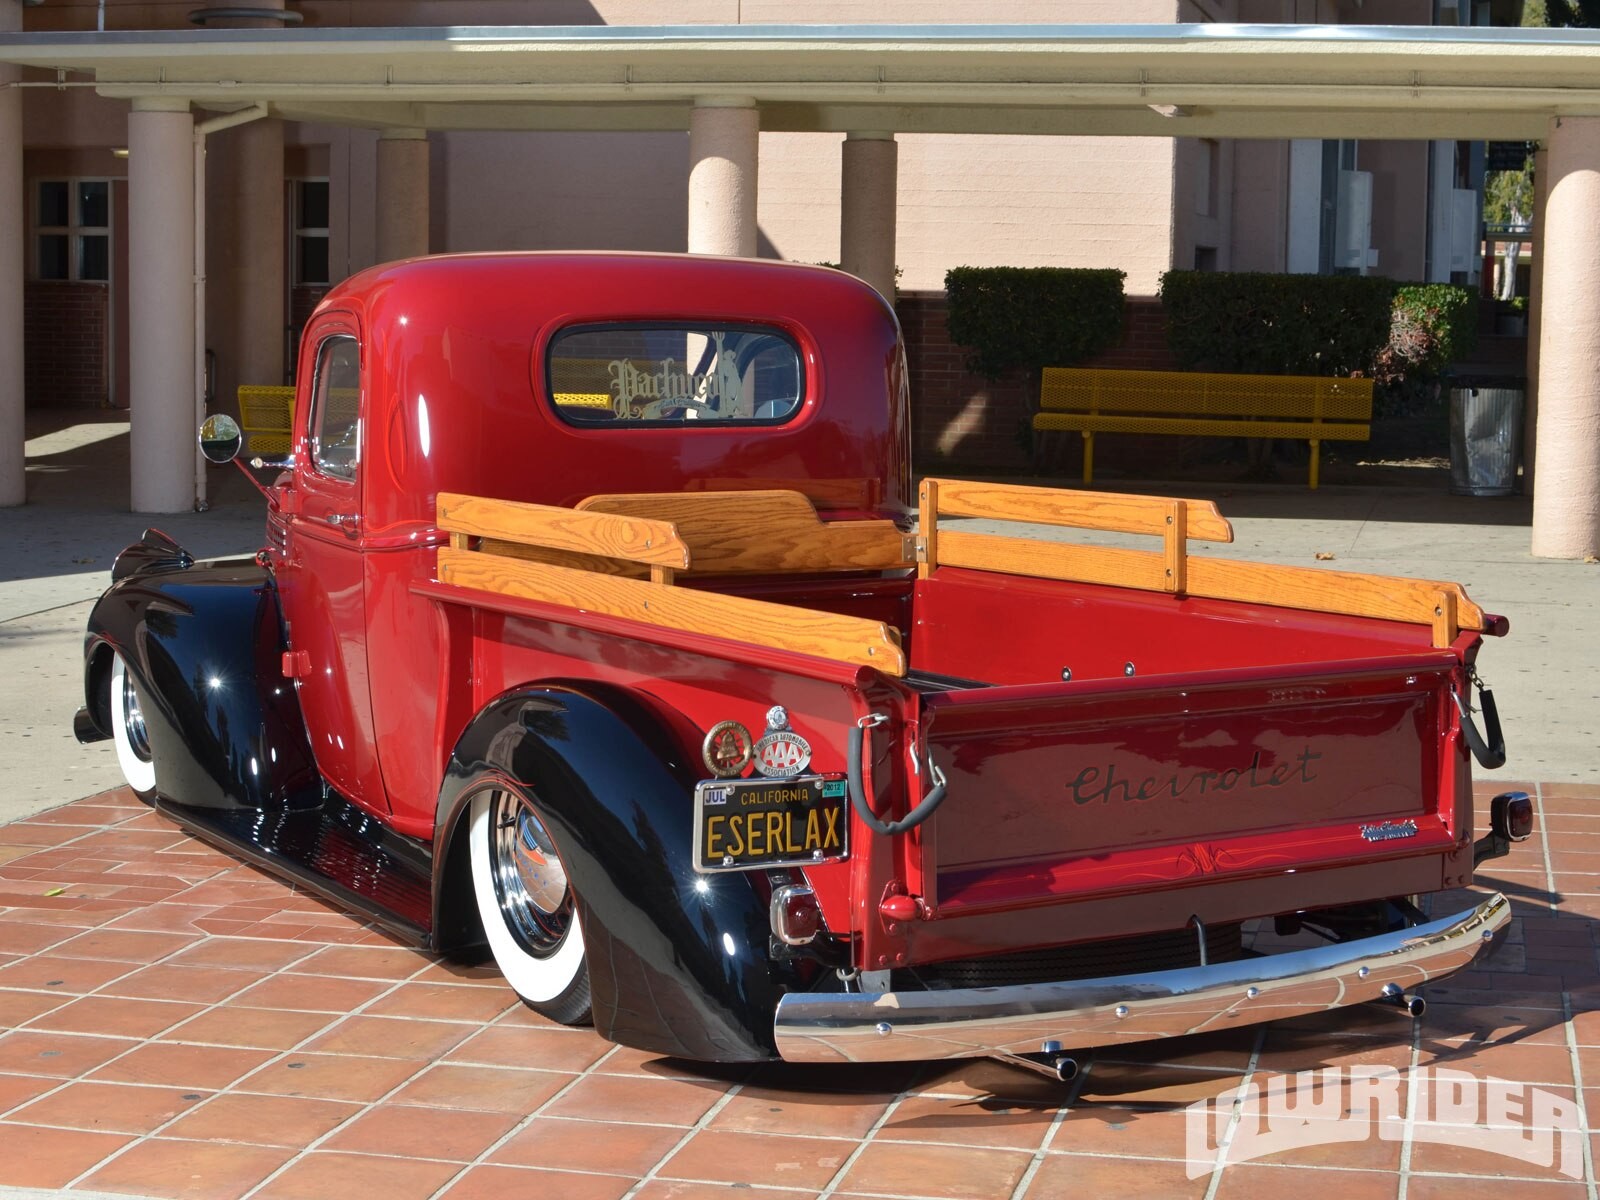 1301-lrmp-01-o-1946-chevrolet-truck-driver-side-rear-quarter-view1